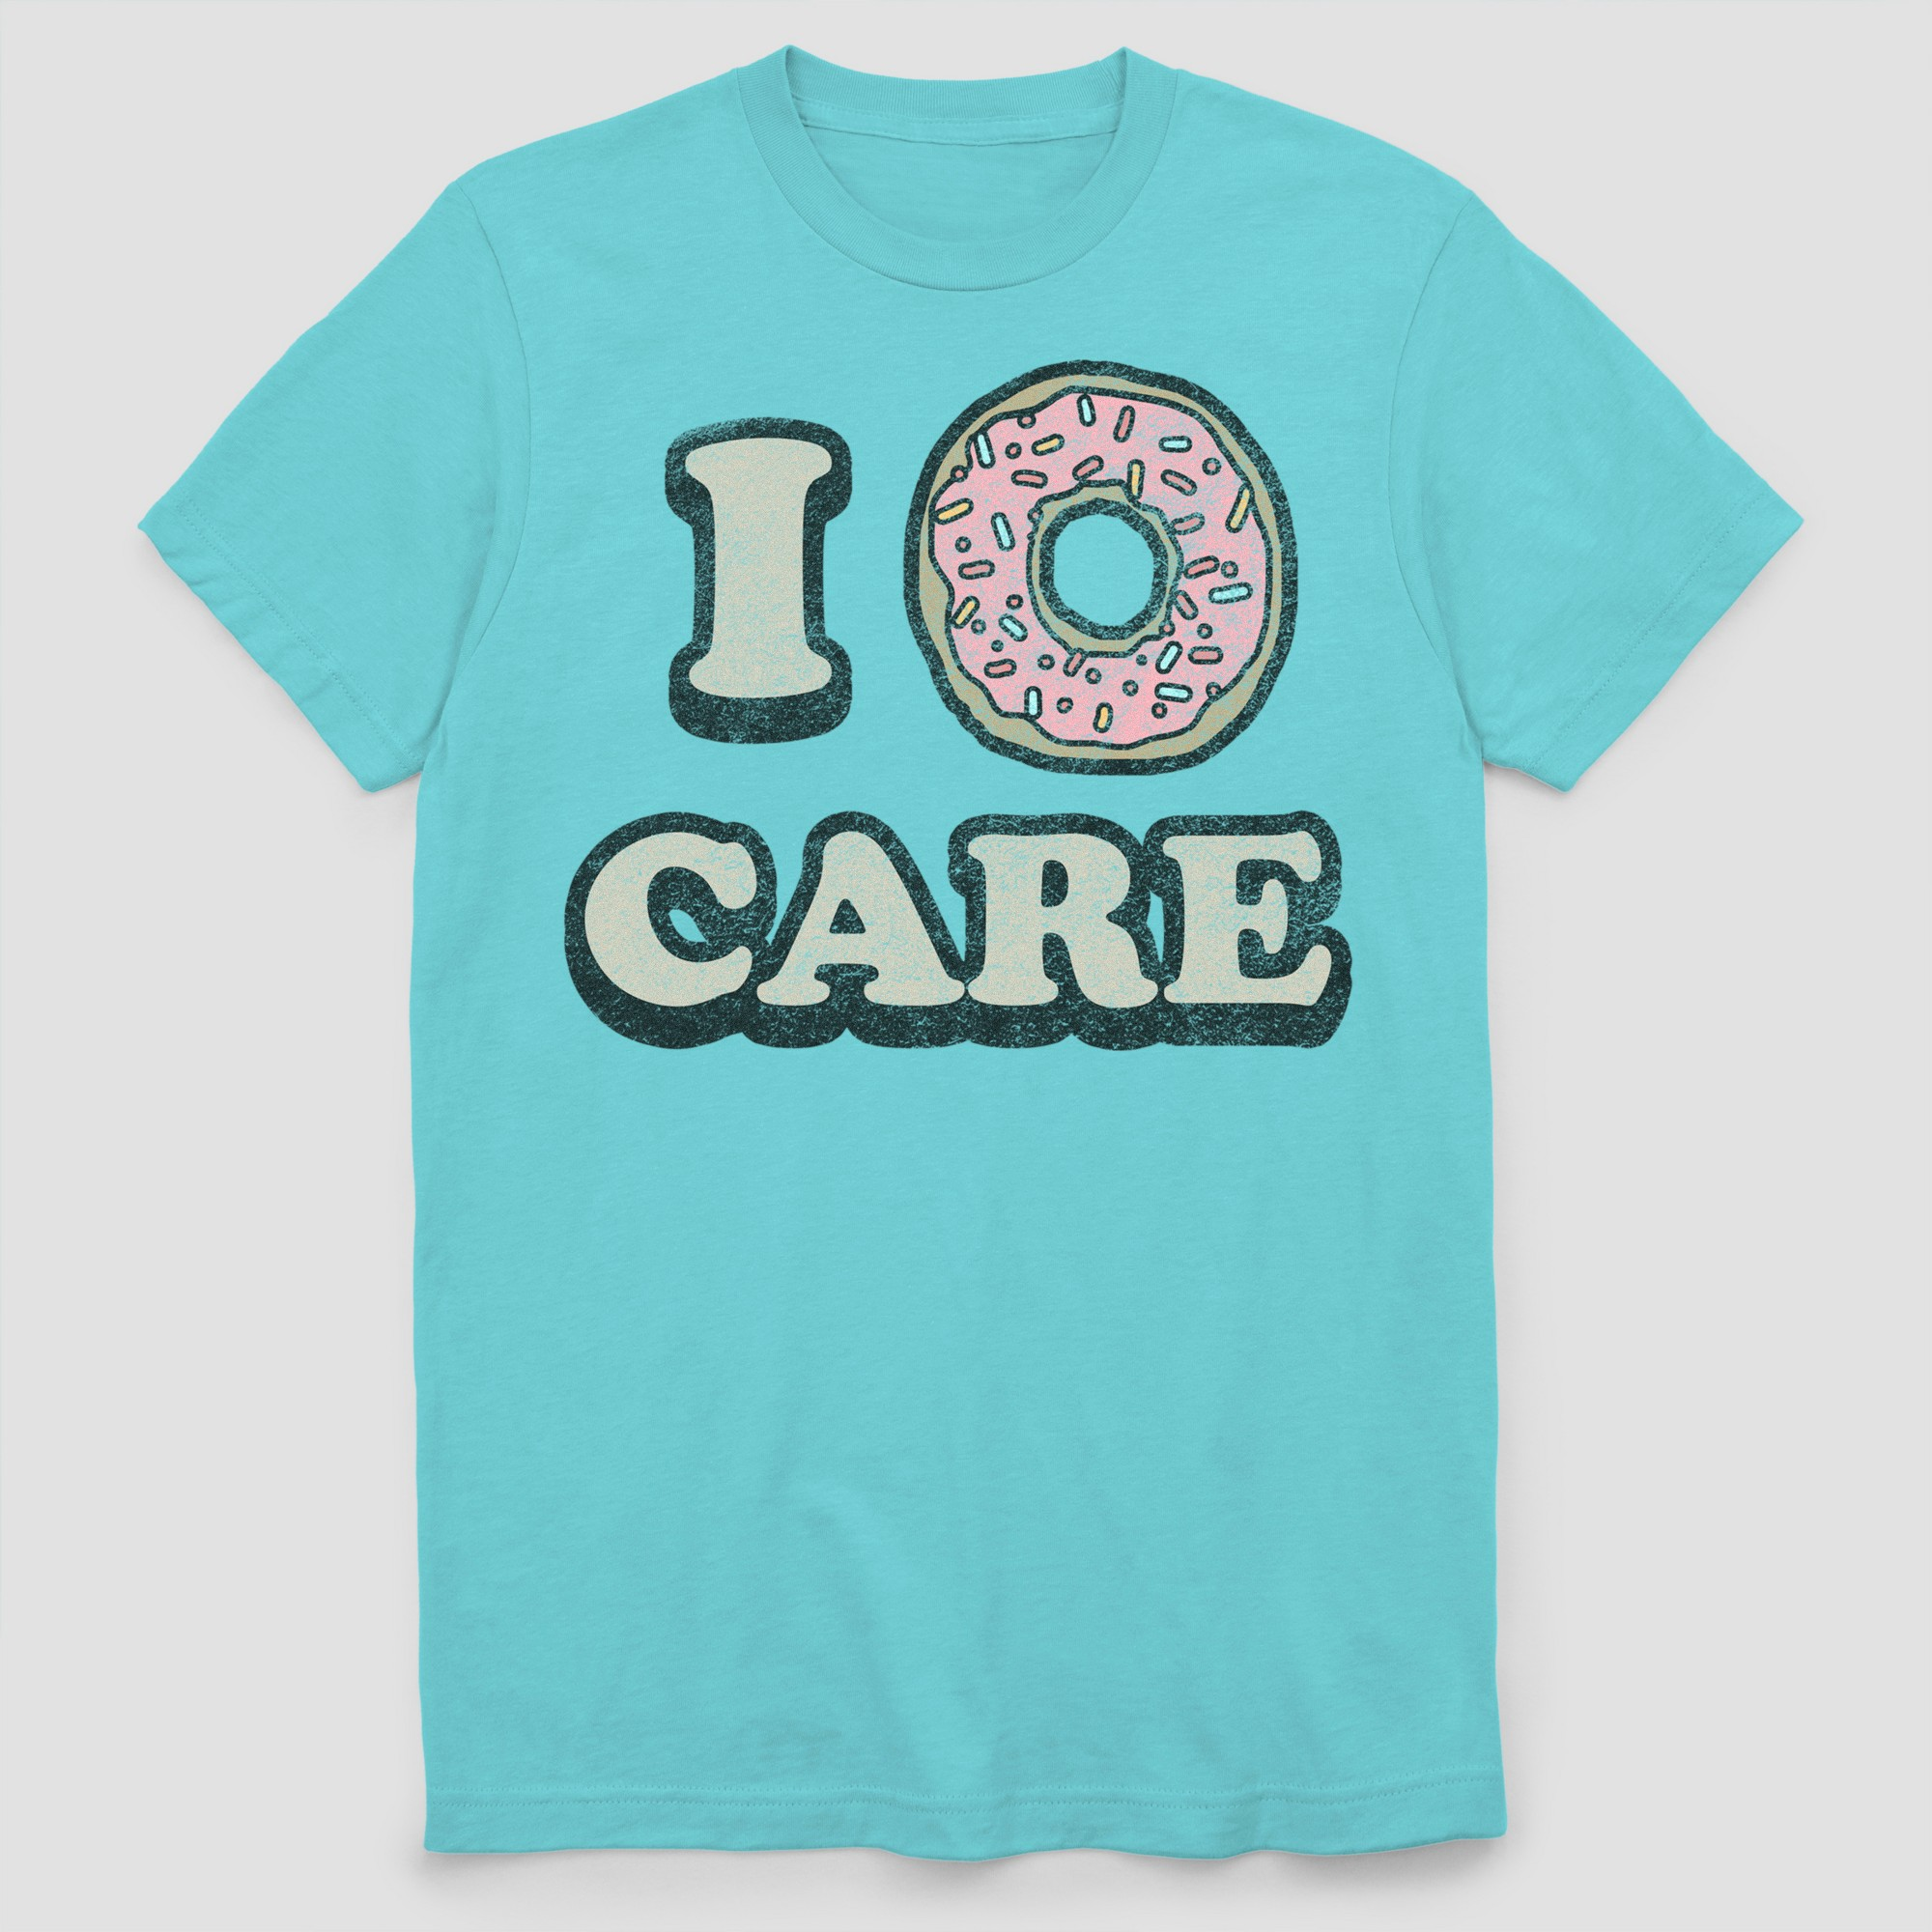 d8ac5cb1a Men's I Donut Care Short Sleeve Graphic T-Shirt - Light Blue 2XL ...